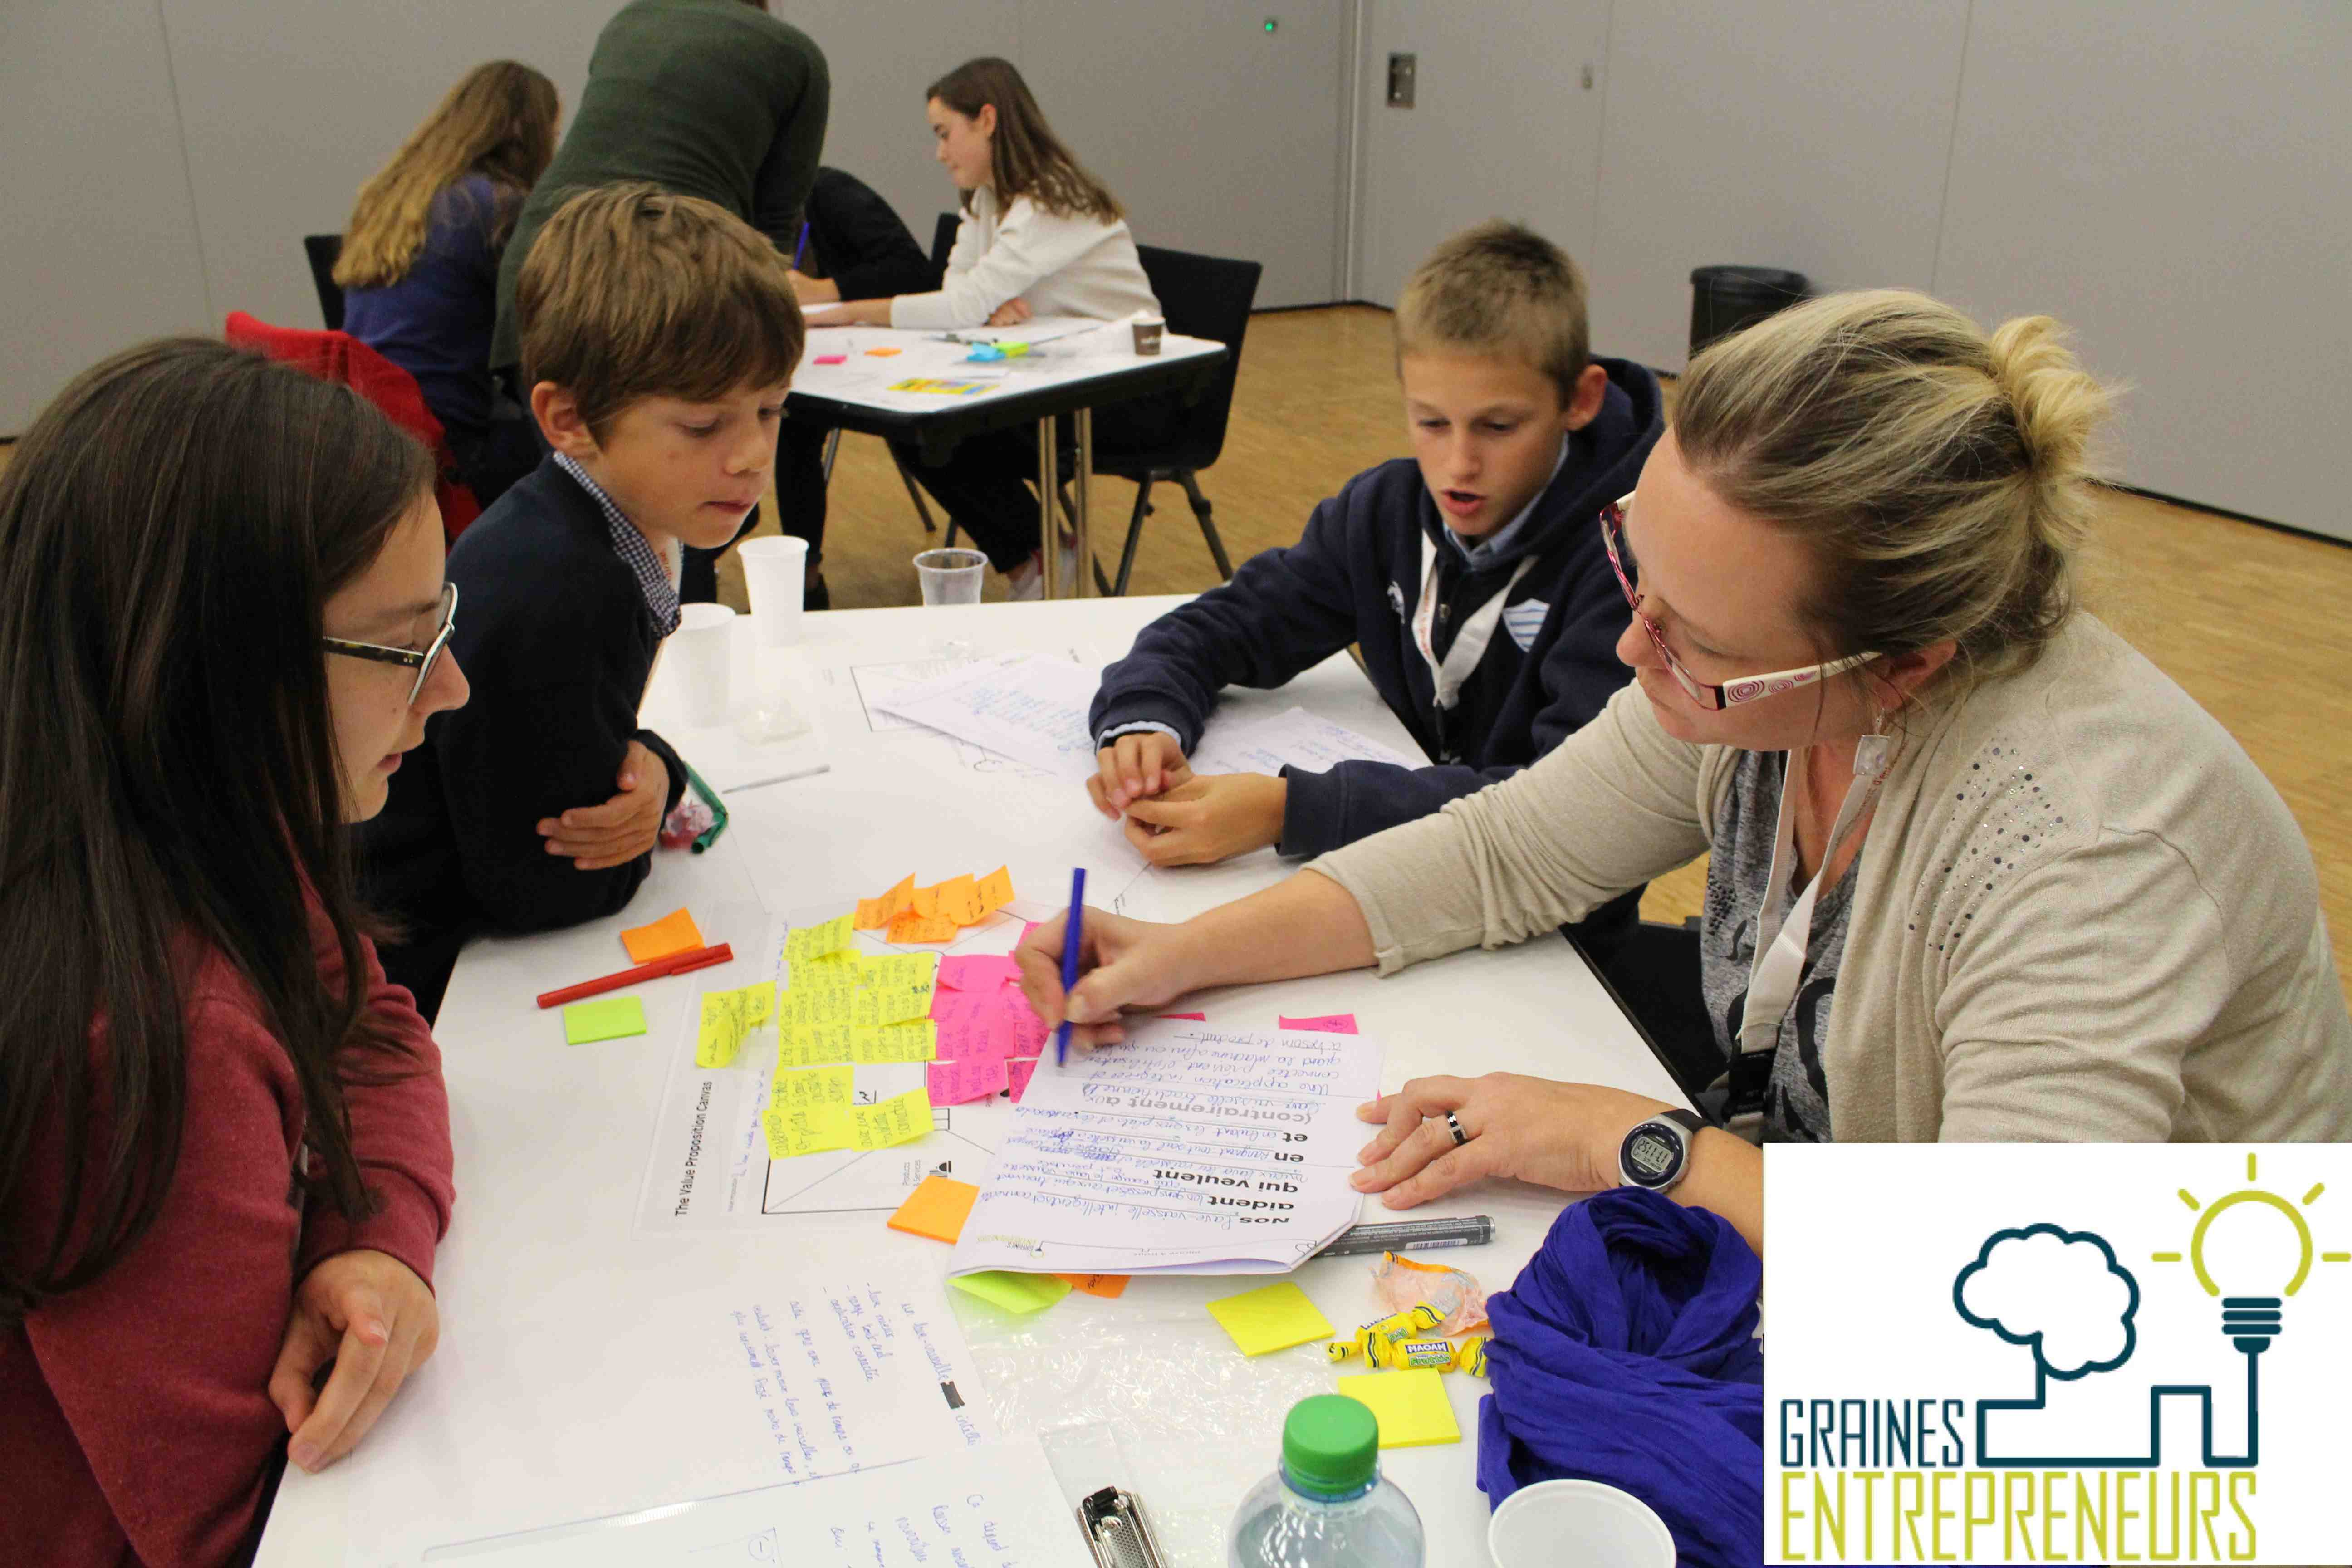 Graines d entrepreneurs Junior startup day genilem FER geneve coach entrepreneuriat innovation enfan